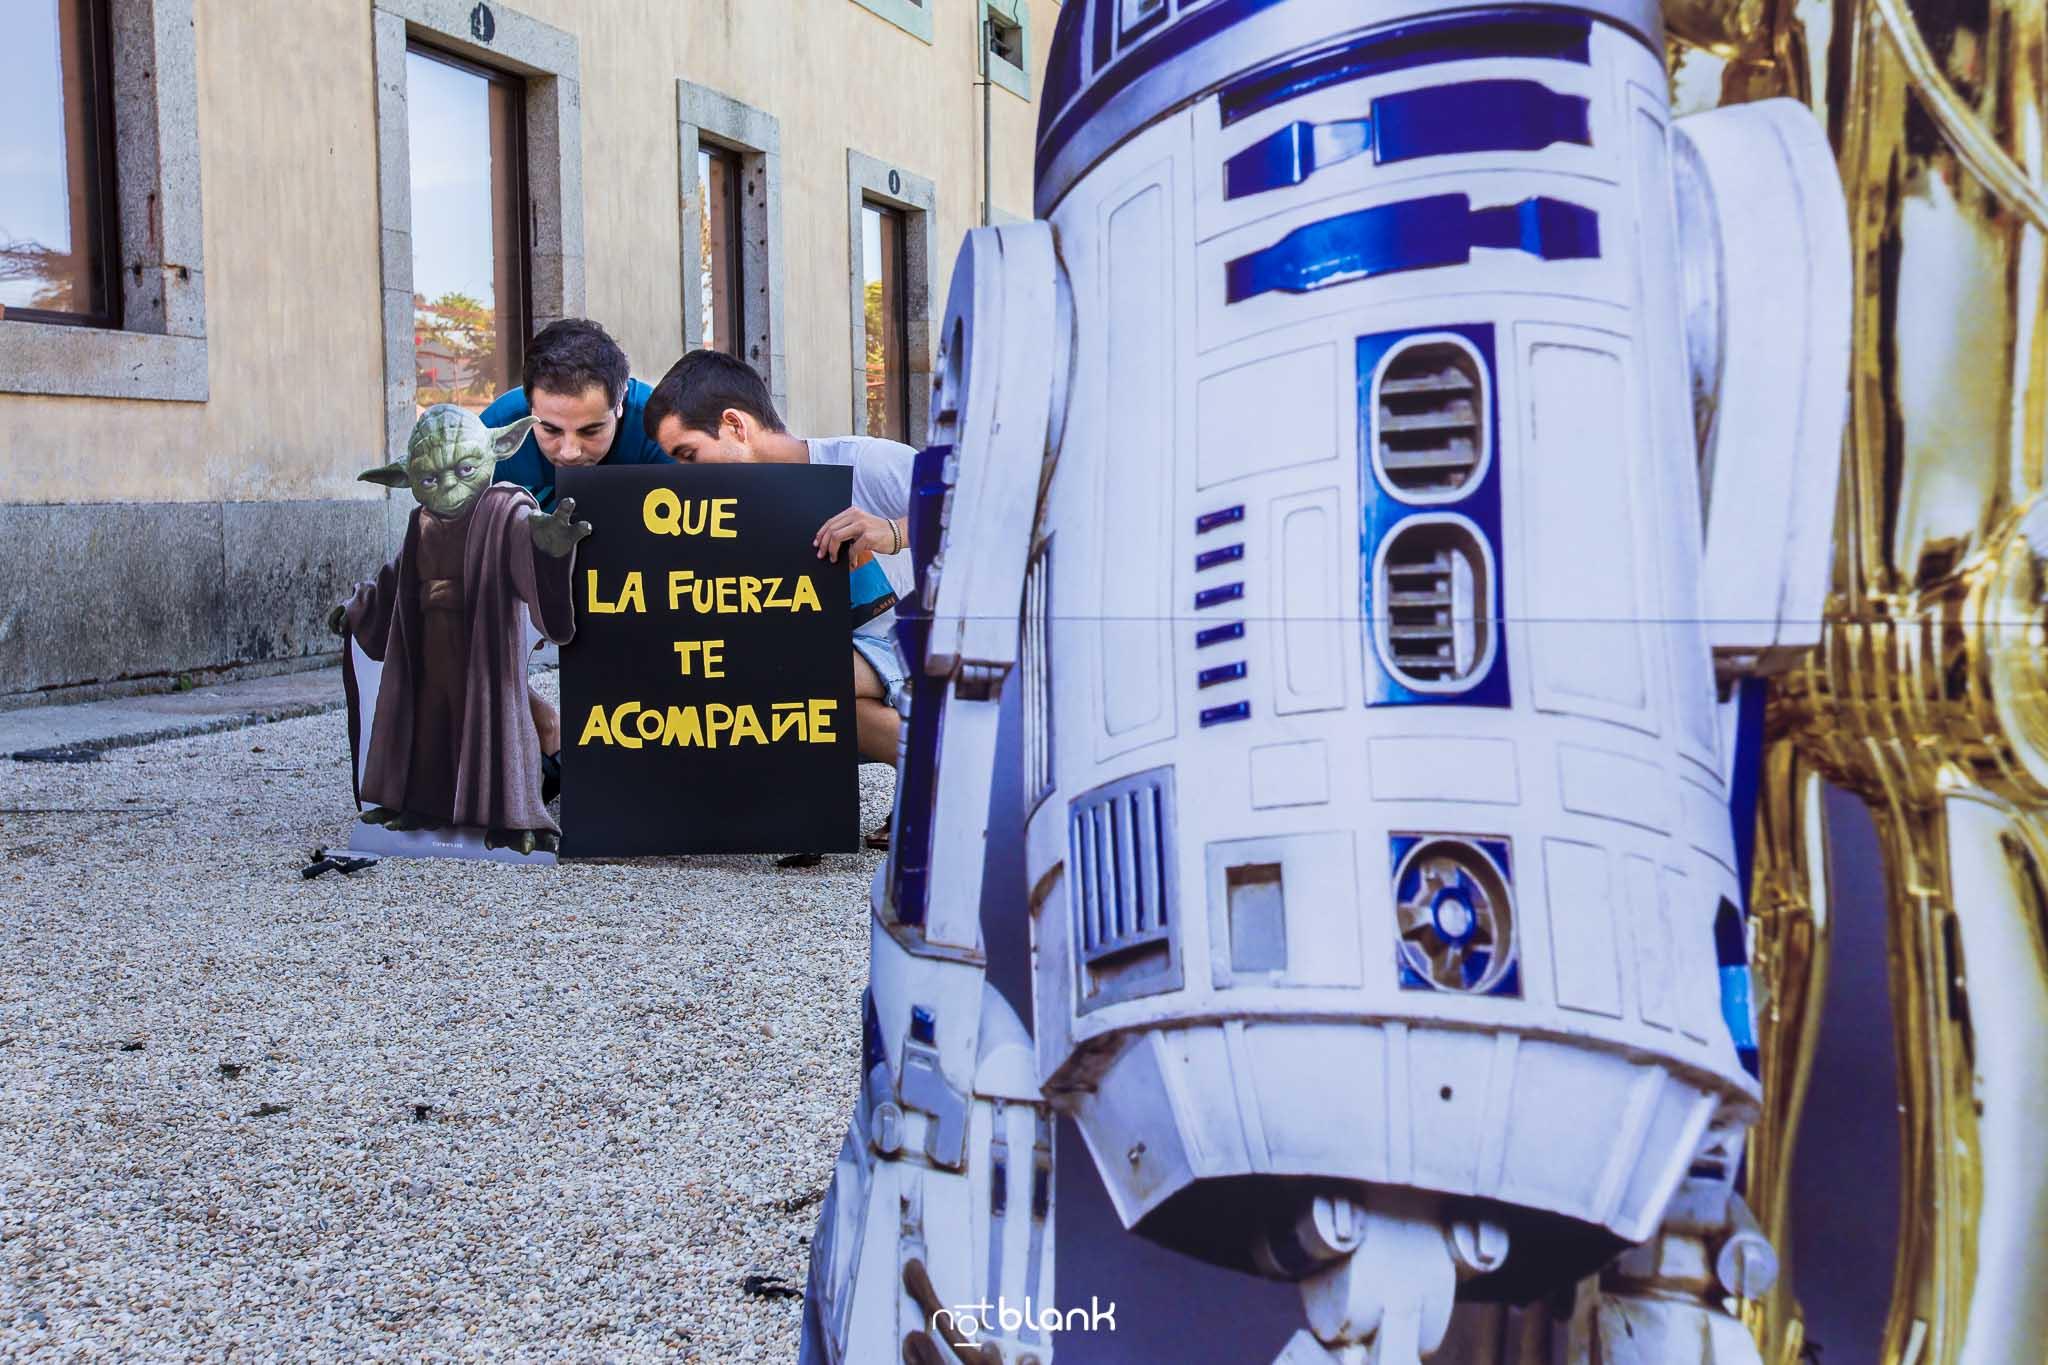 notblank-boda-Fotógrafo de boda-Malaposta-Portugal-Invitados-Boda Temática-R2D2-3CPO-Star Wars-Que la fuerza te acompañe